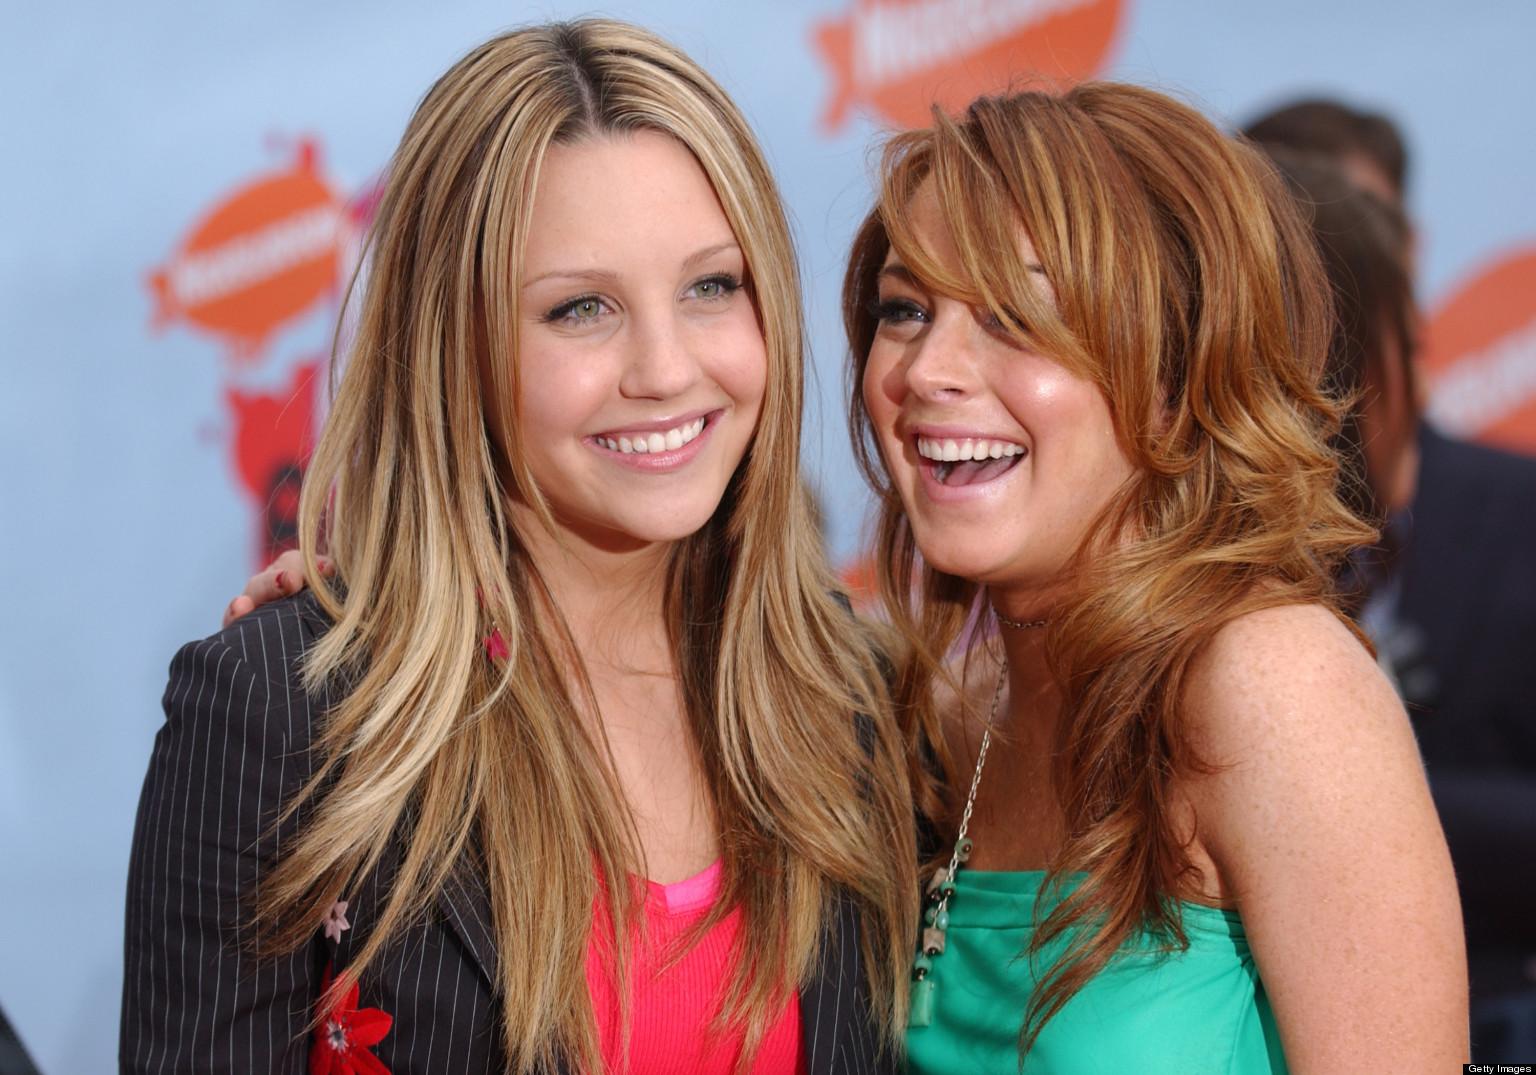 Amanda Bynes Lindsay Lohan Alexis Bledel And The Olsen Twins Covered Vanity Fair In July 2003